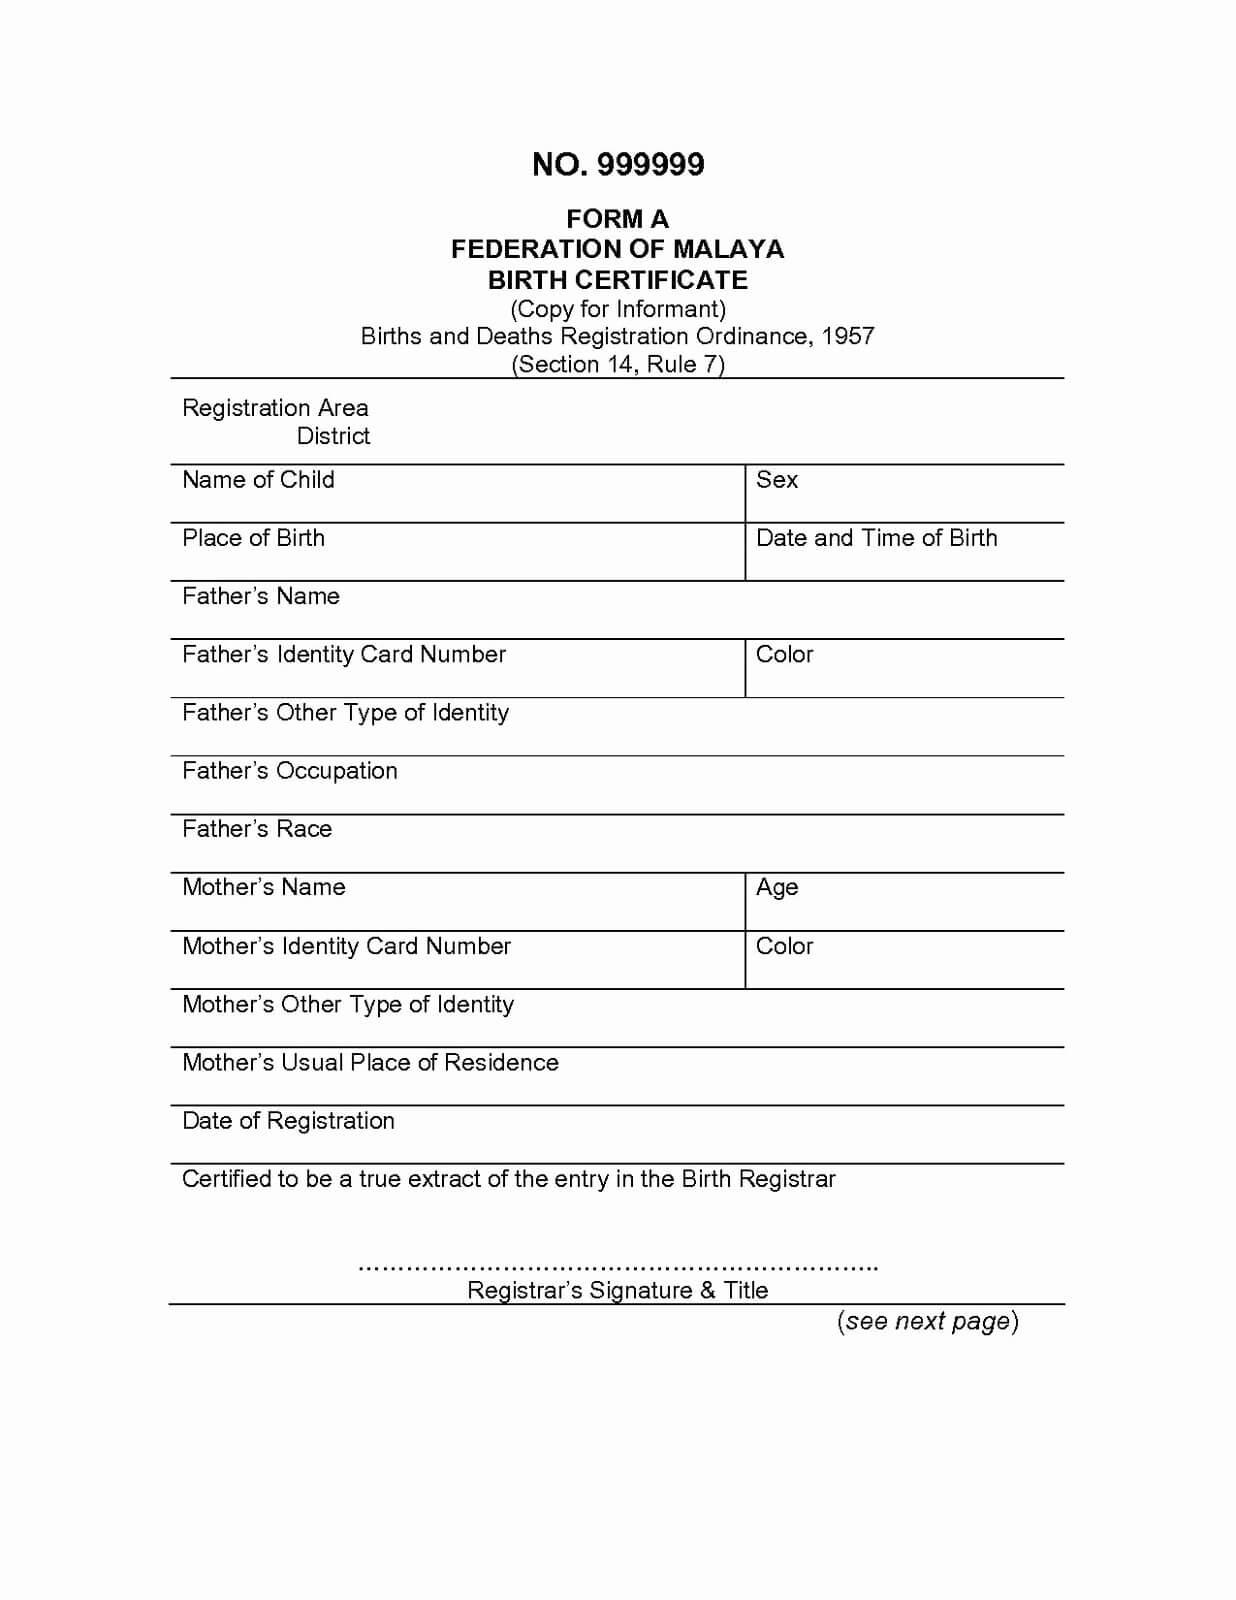 Marriage Certificate Translation Template - Atlantaauctionco in Uscis Birth Certificate Translation Template